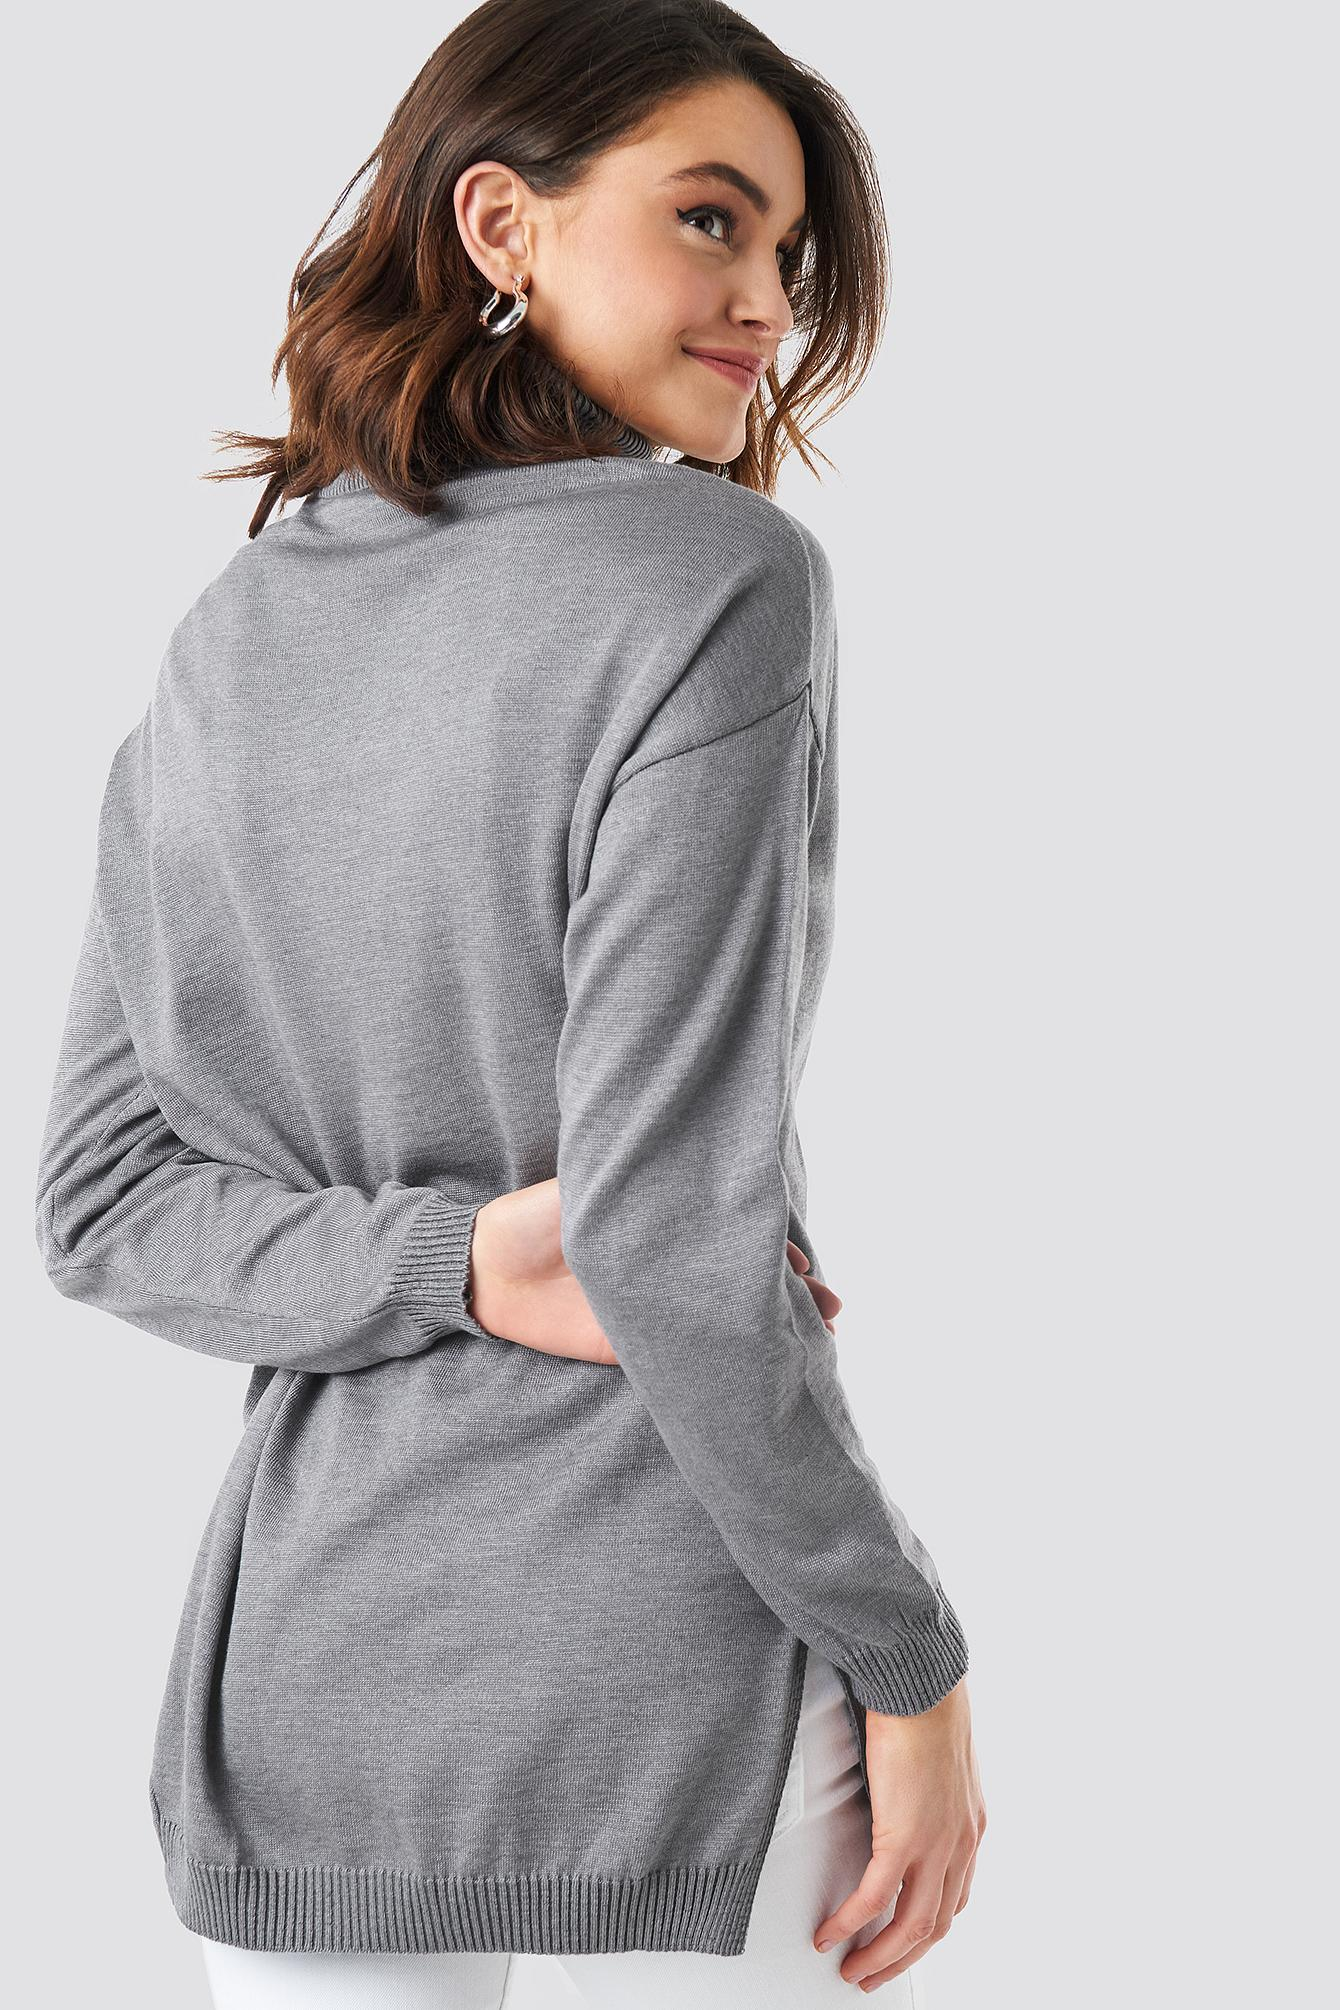 Ladies Womens Side Split Cowl Turtle Neck Top Polo Slit Swing Stretch Mini Dress